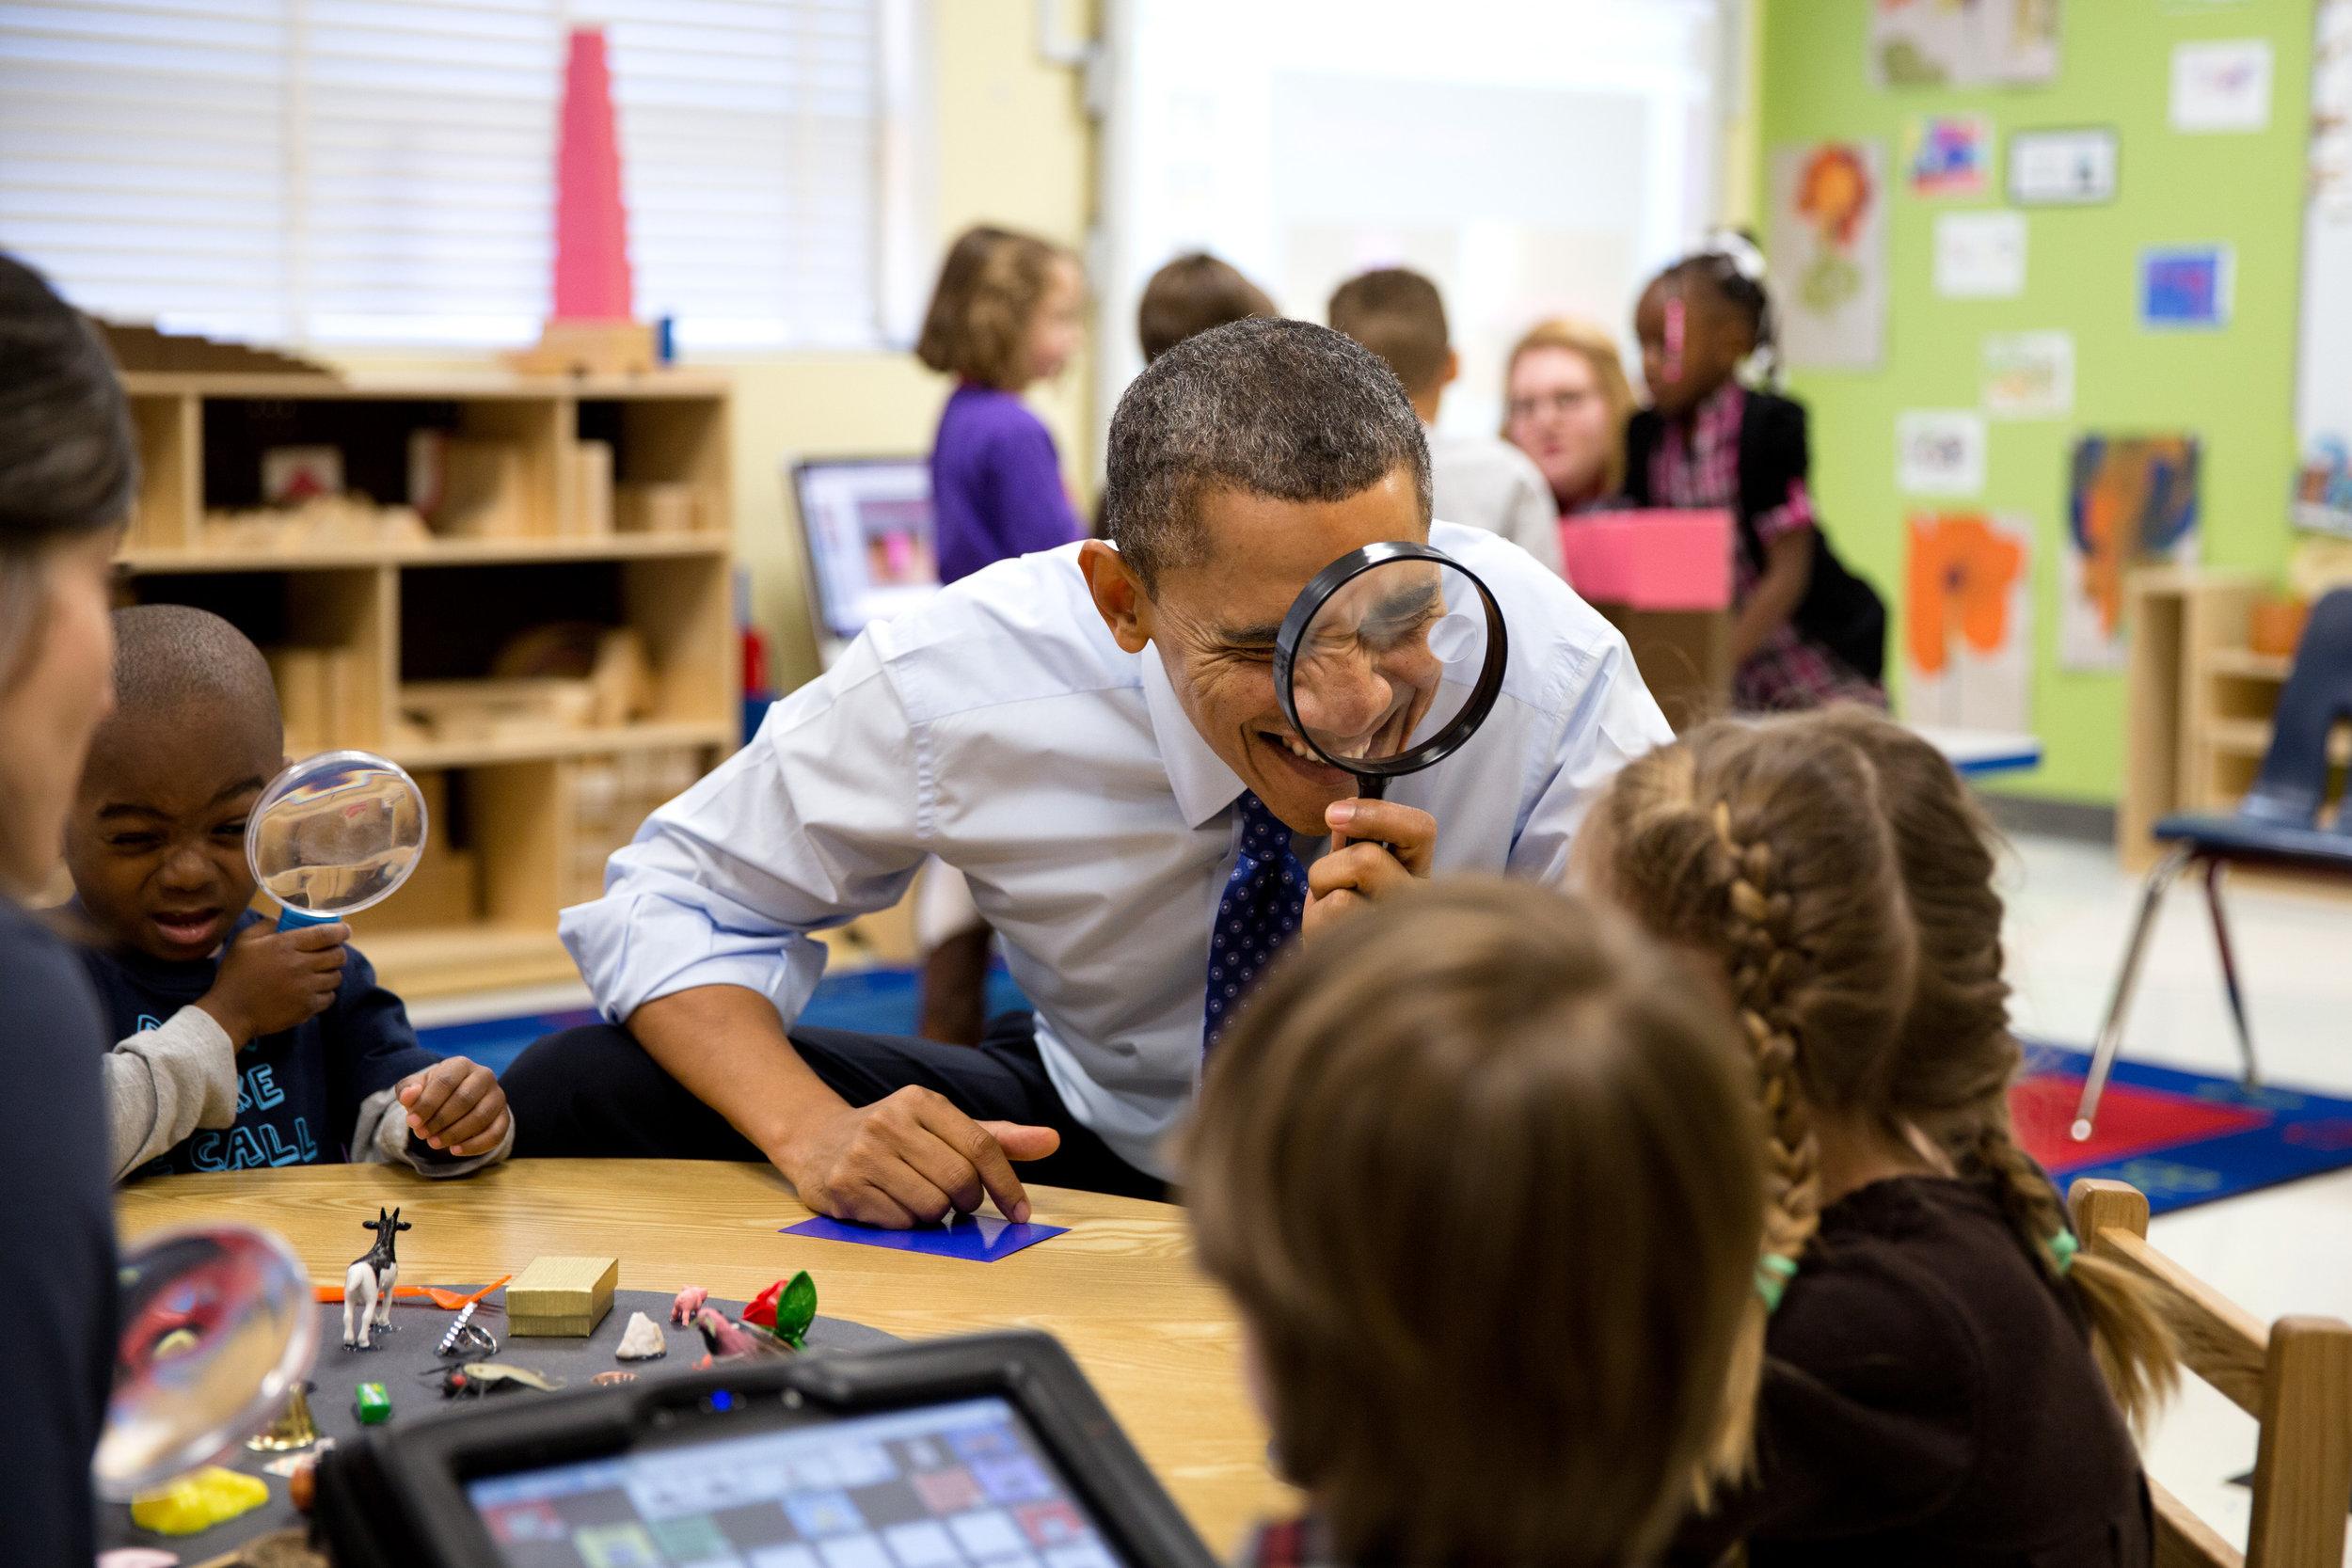 Barack_Obama_through_a_magnifying_glass.jpg